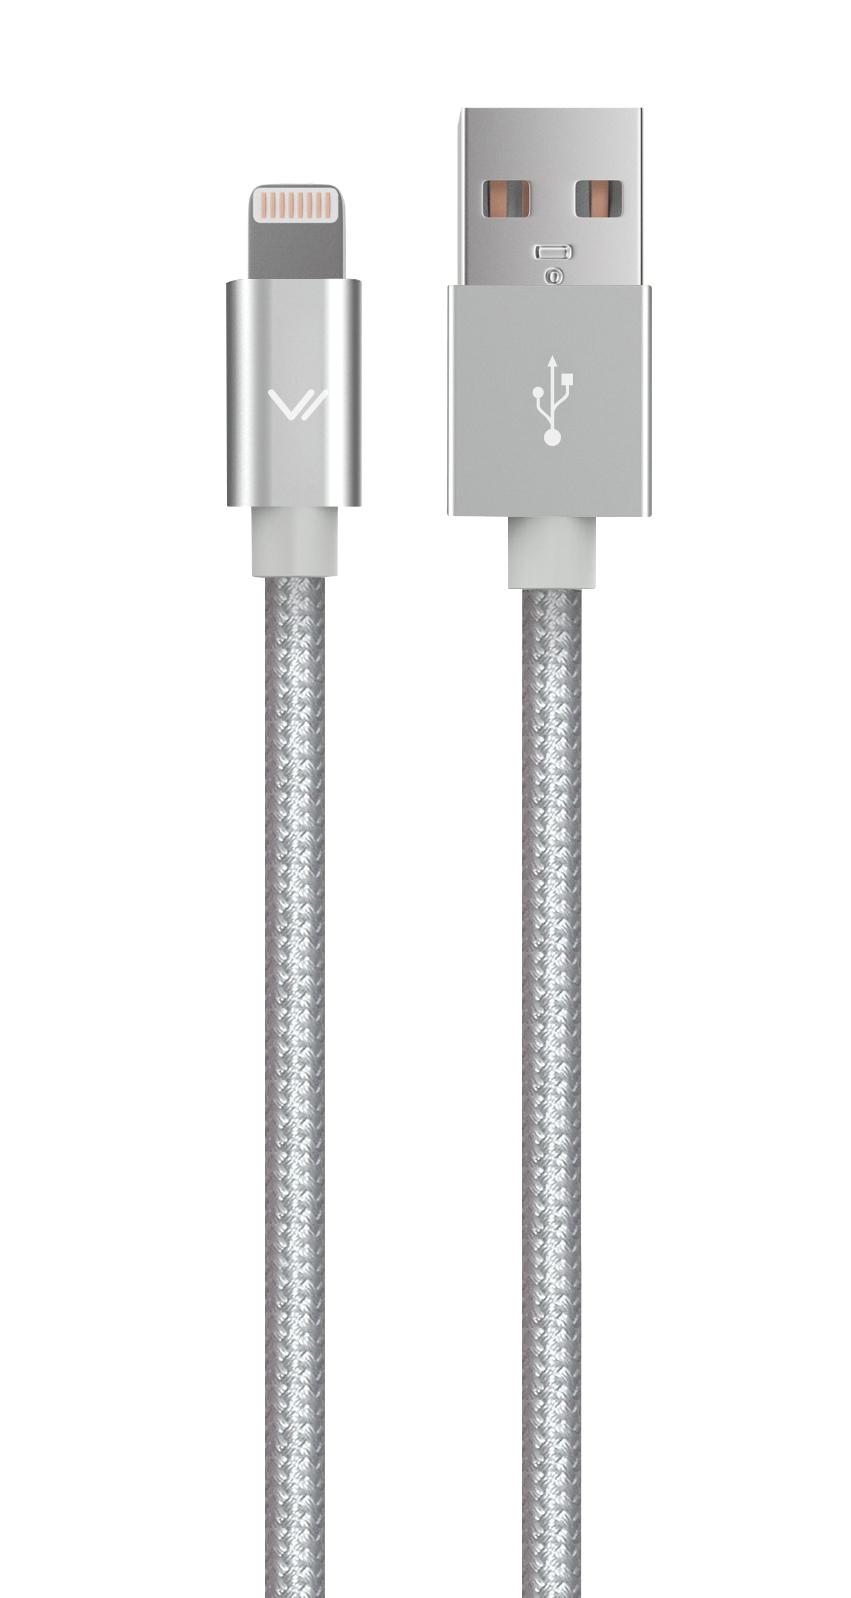 Дата-кабель Vertex от МТС